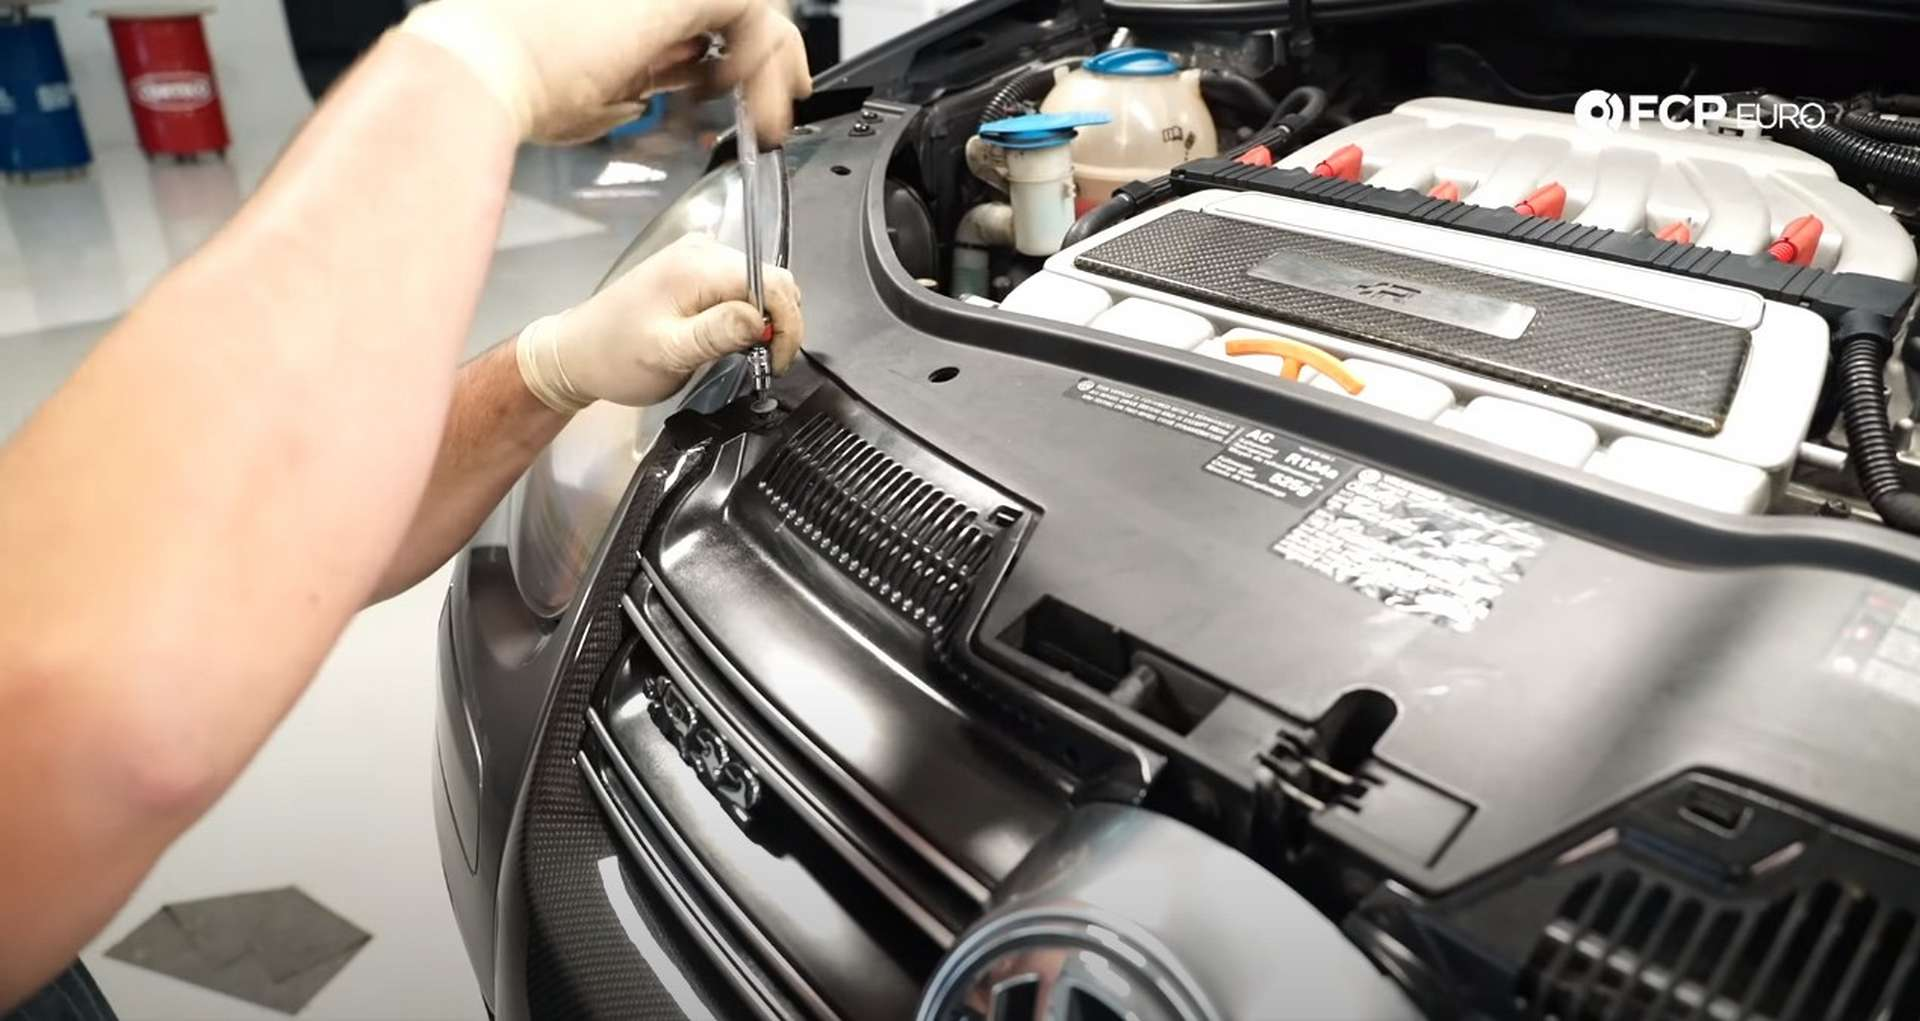 69-DIY-VW-VR6-Valve-Cover-Gasket-Reset-The-Nose